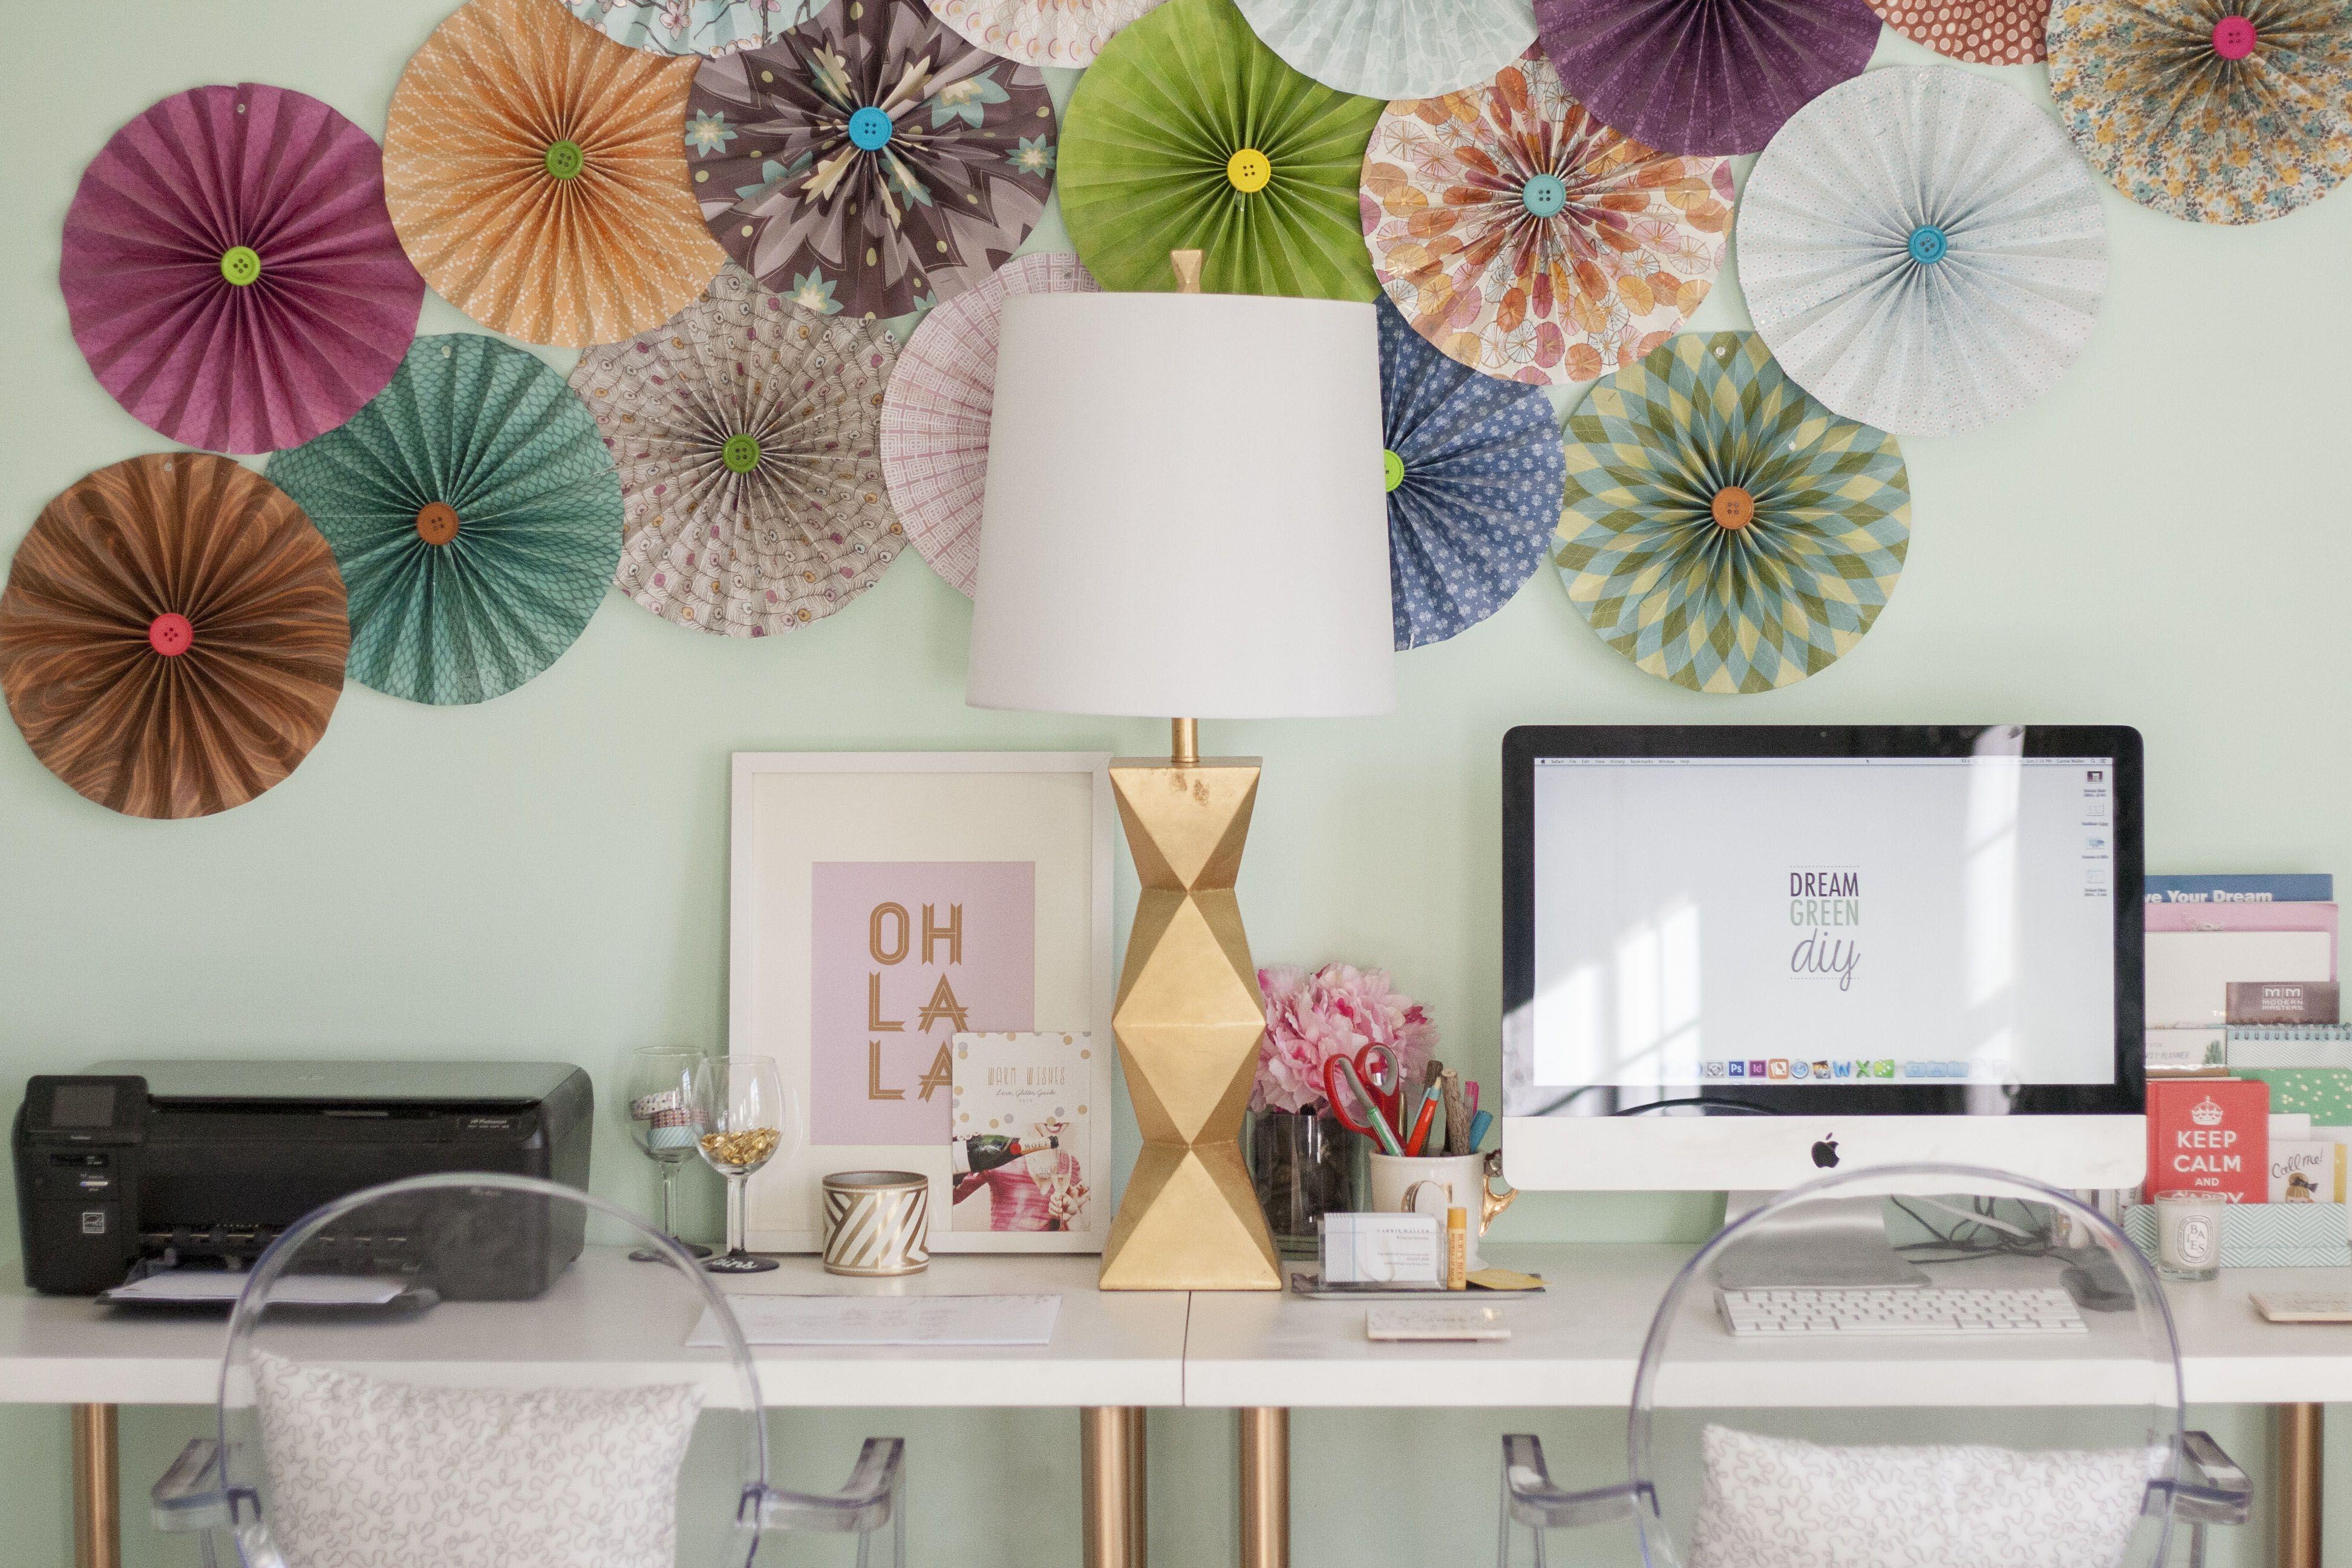 Ikeadeskhack desk for apartment ideas pinterest